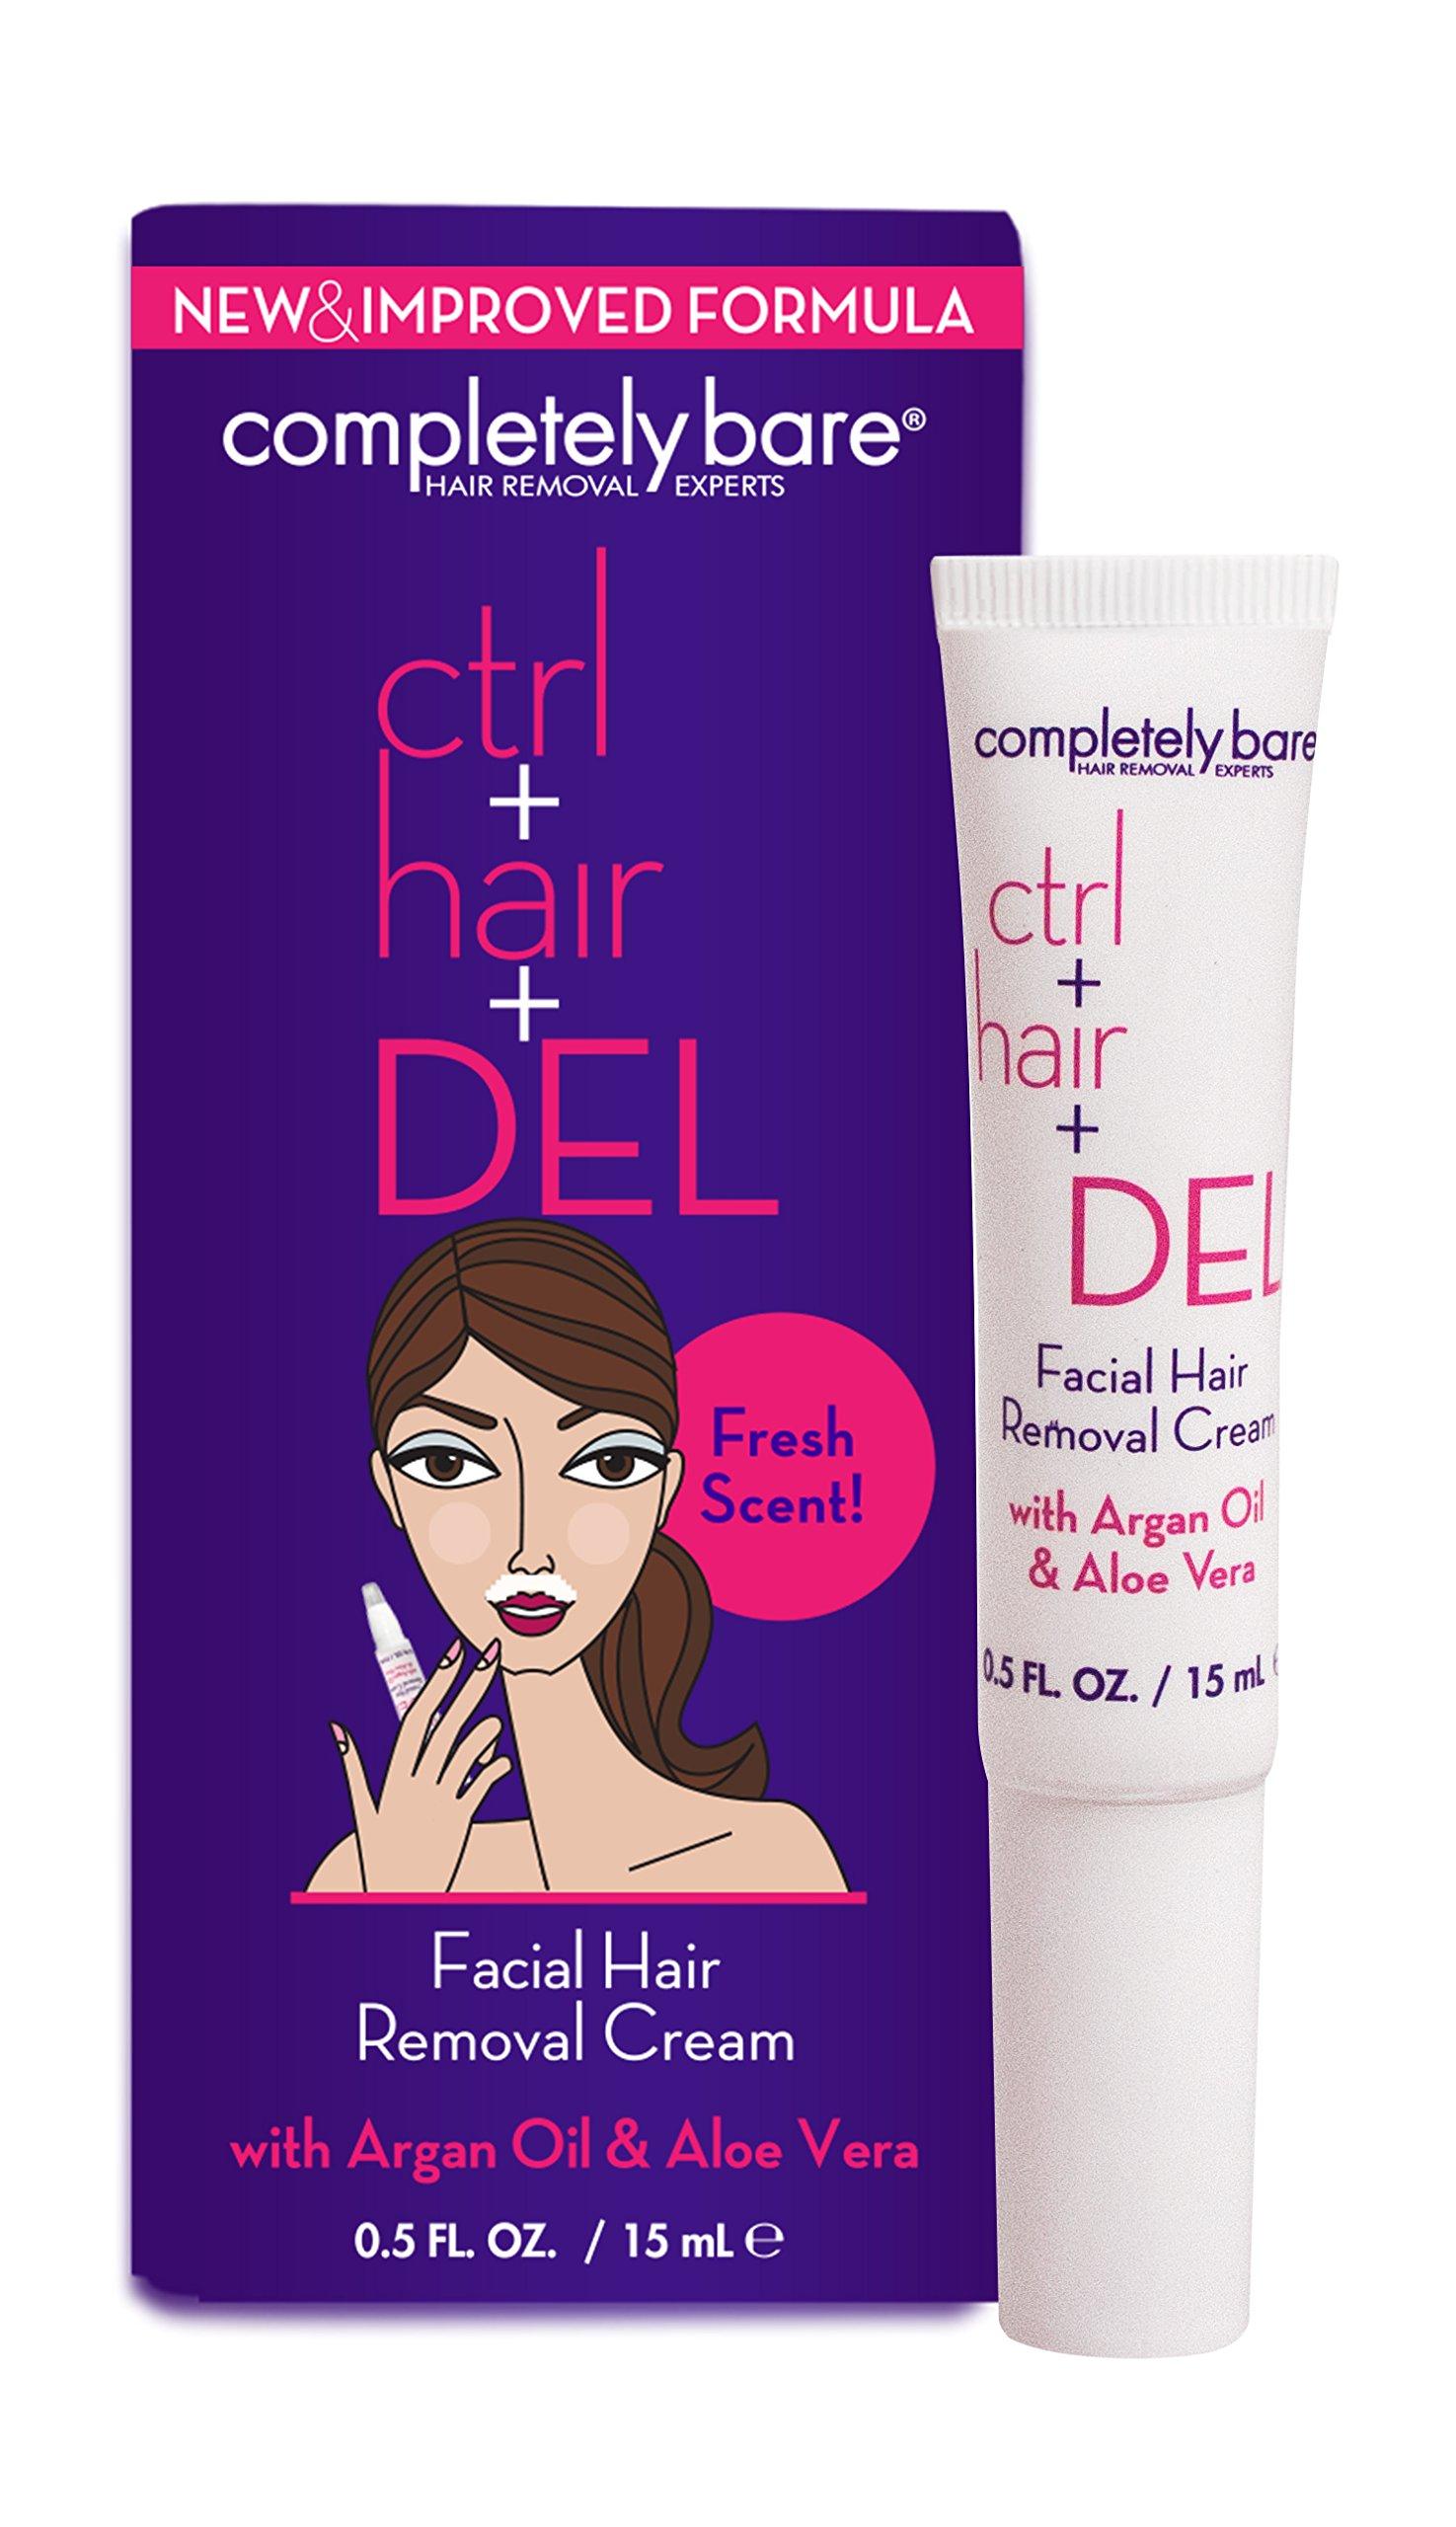 Completely Bare Ctrl + Hair + DEL Facial Hair Removal Cream - All Natural Ingredients, Argan Oil & Aloe Vera, Mositurizing Extract Depilatory Cream, Cruelty-Free & Paraben-Free, Vegan Formula.5 oz